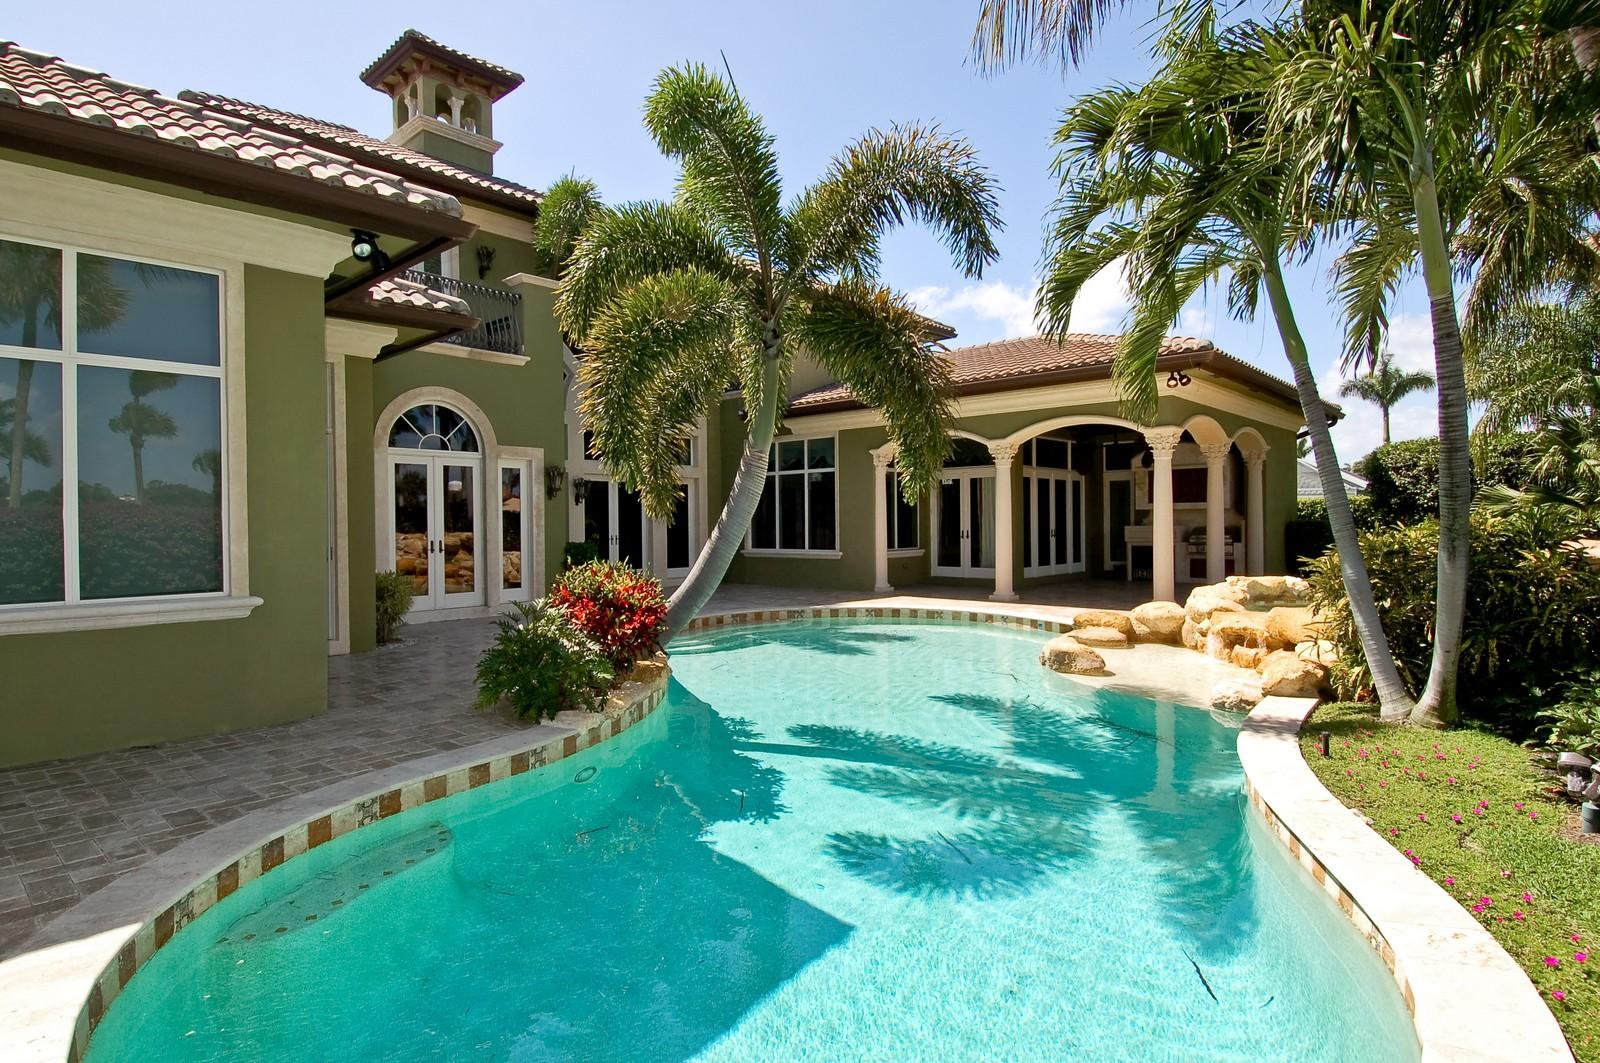 Real Estate Photography - 215 Royal Palm Way, Boca Raton, FL, 33432 - Pool